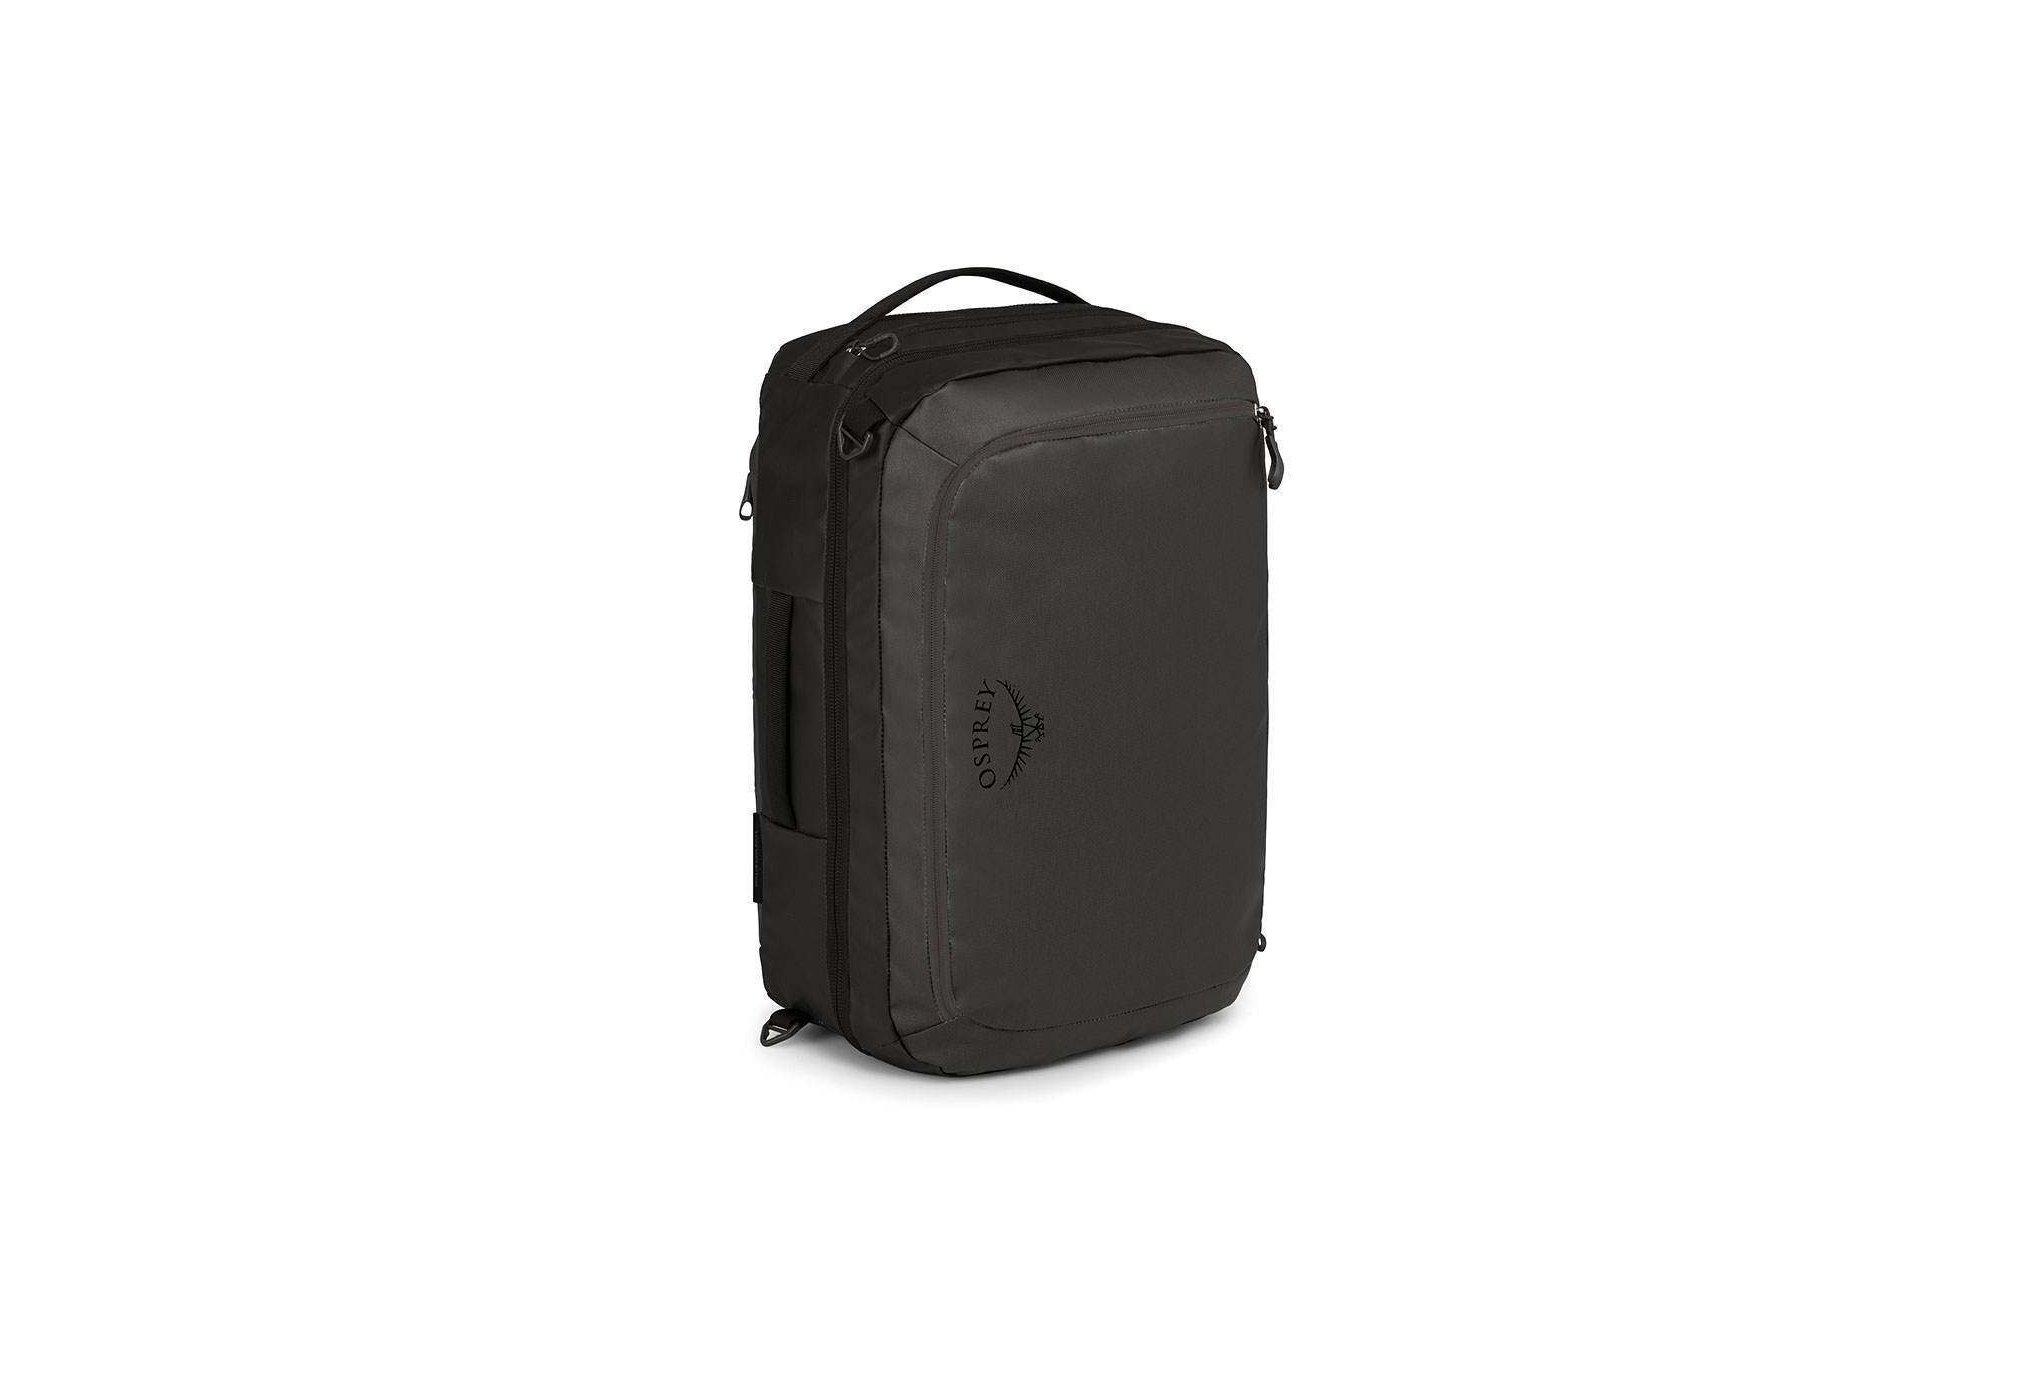 Osprey Transporter Global Carry-On 36 Diététique Accessoires